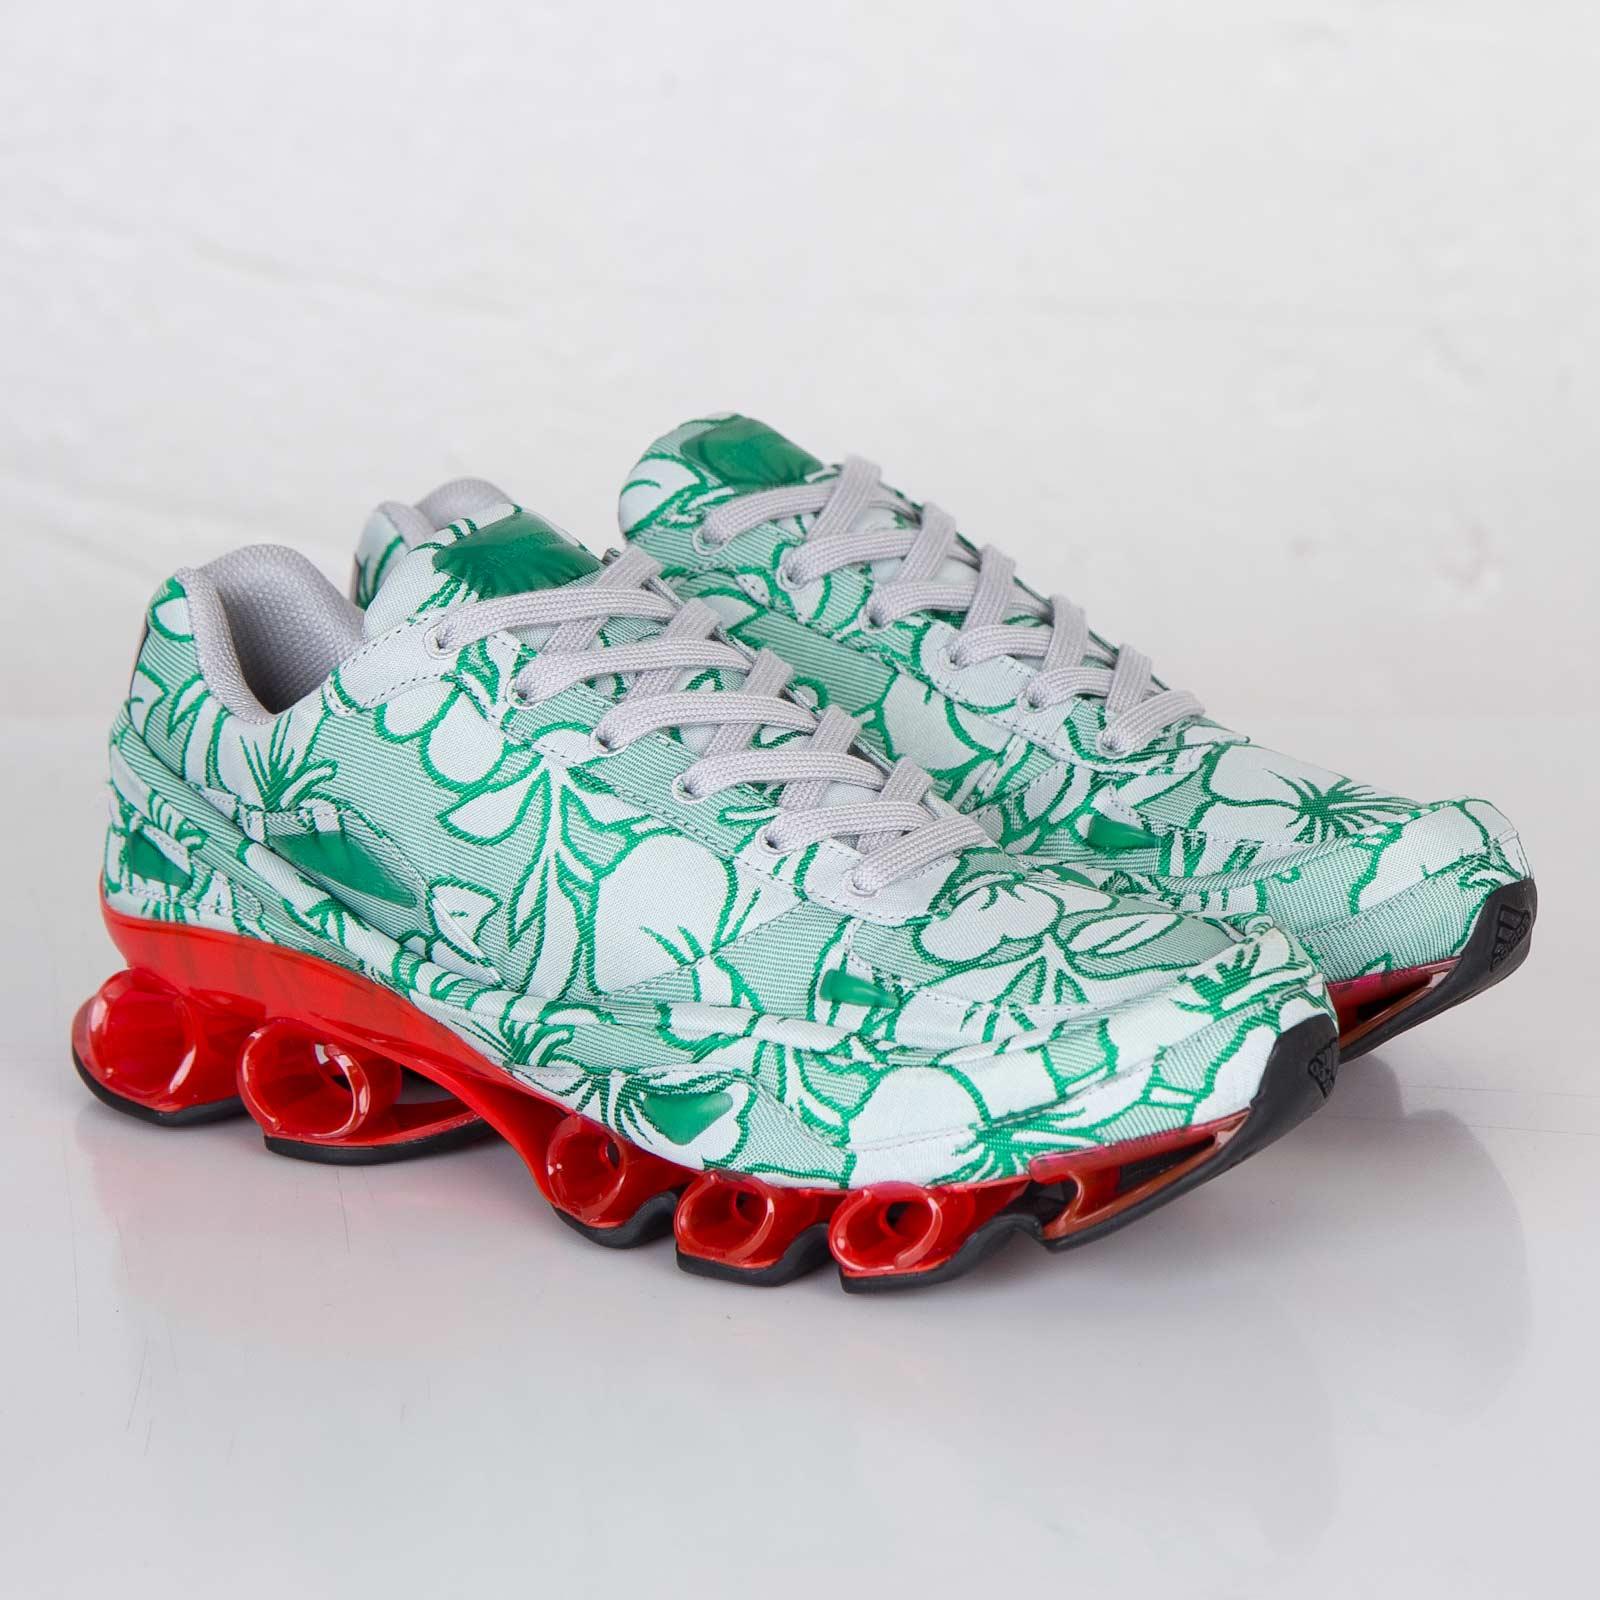 50f4b2562cd90 adidas Raf Simons Bounce - M20566 - Sneakersnstuff